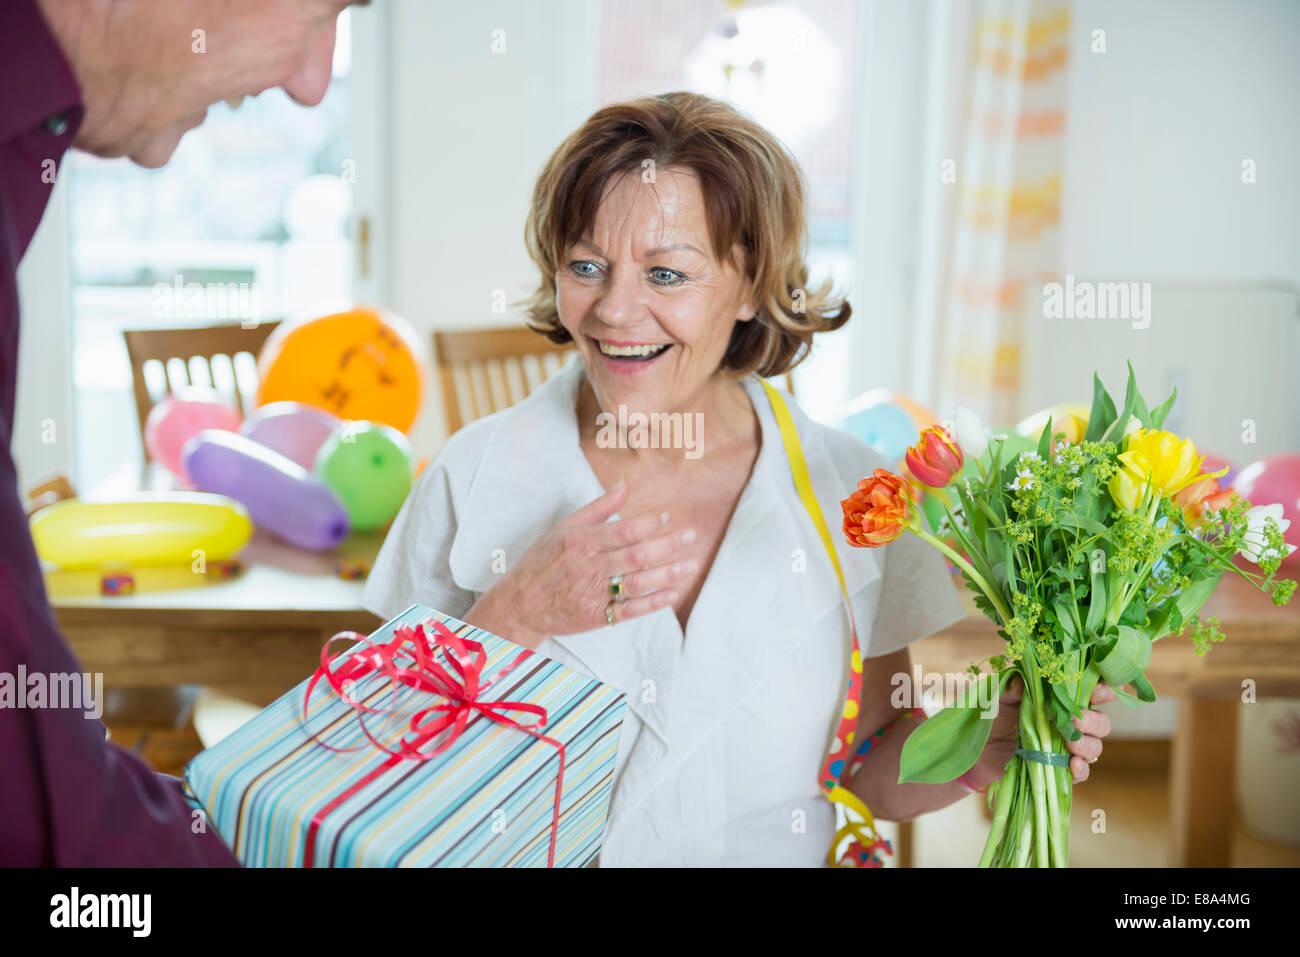 Senior man hand over present to woman on birthday, smiling - Stock Image